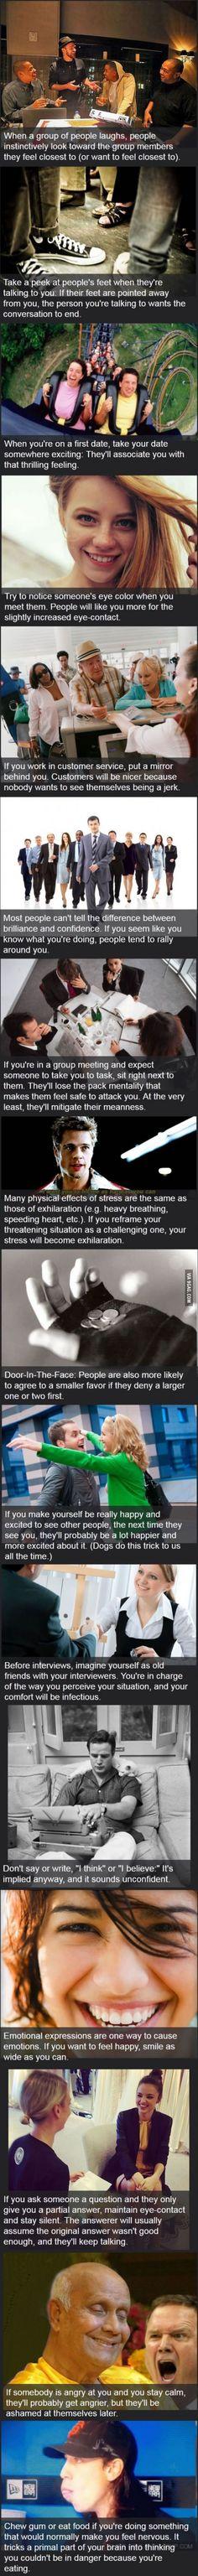 16 Useful Mental Life Hacks